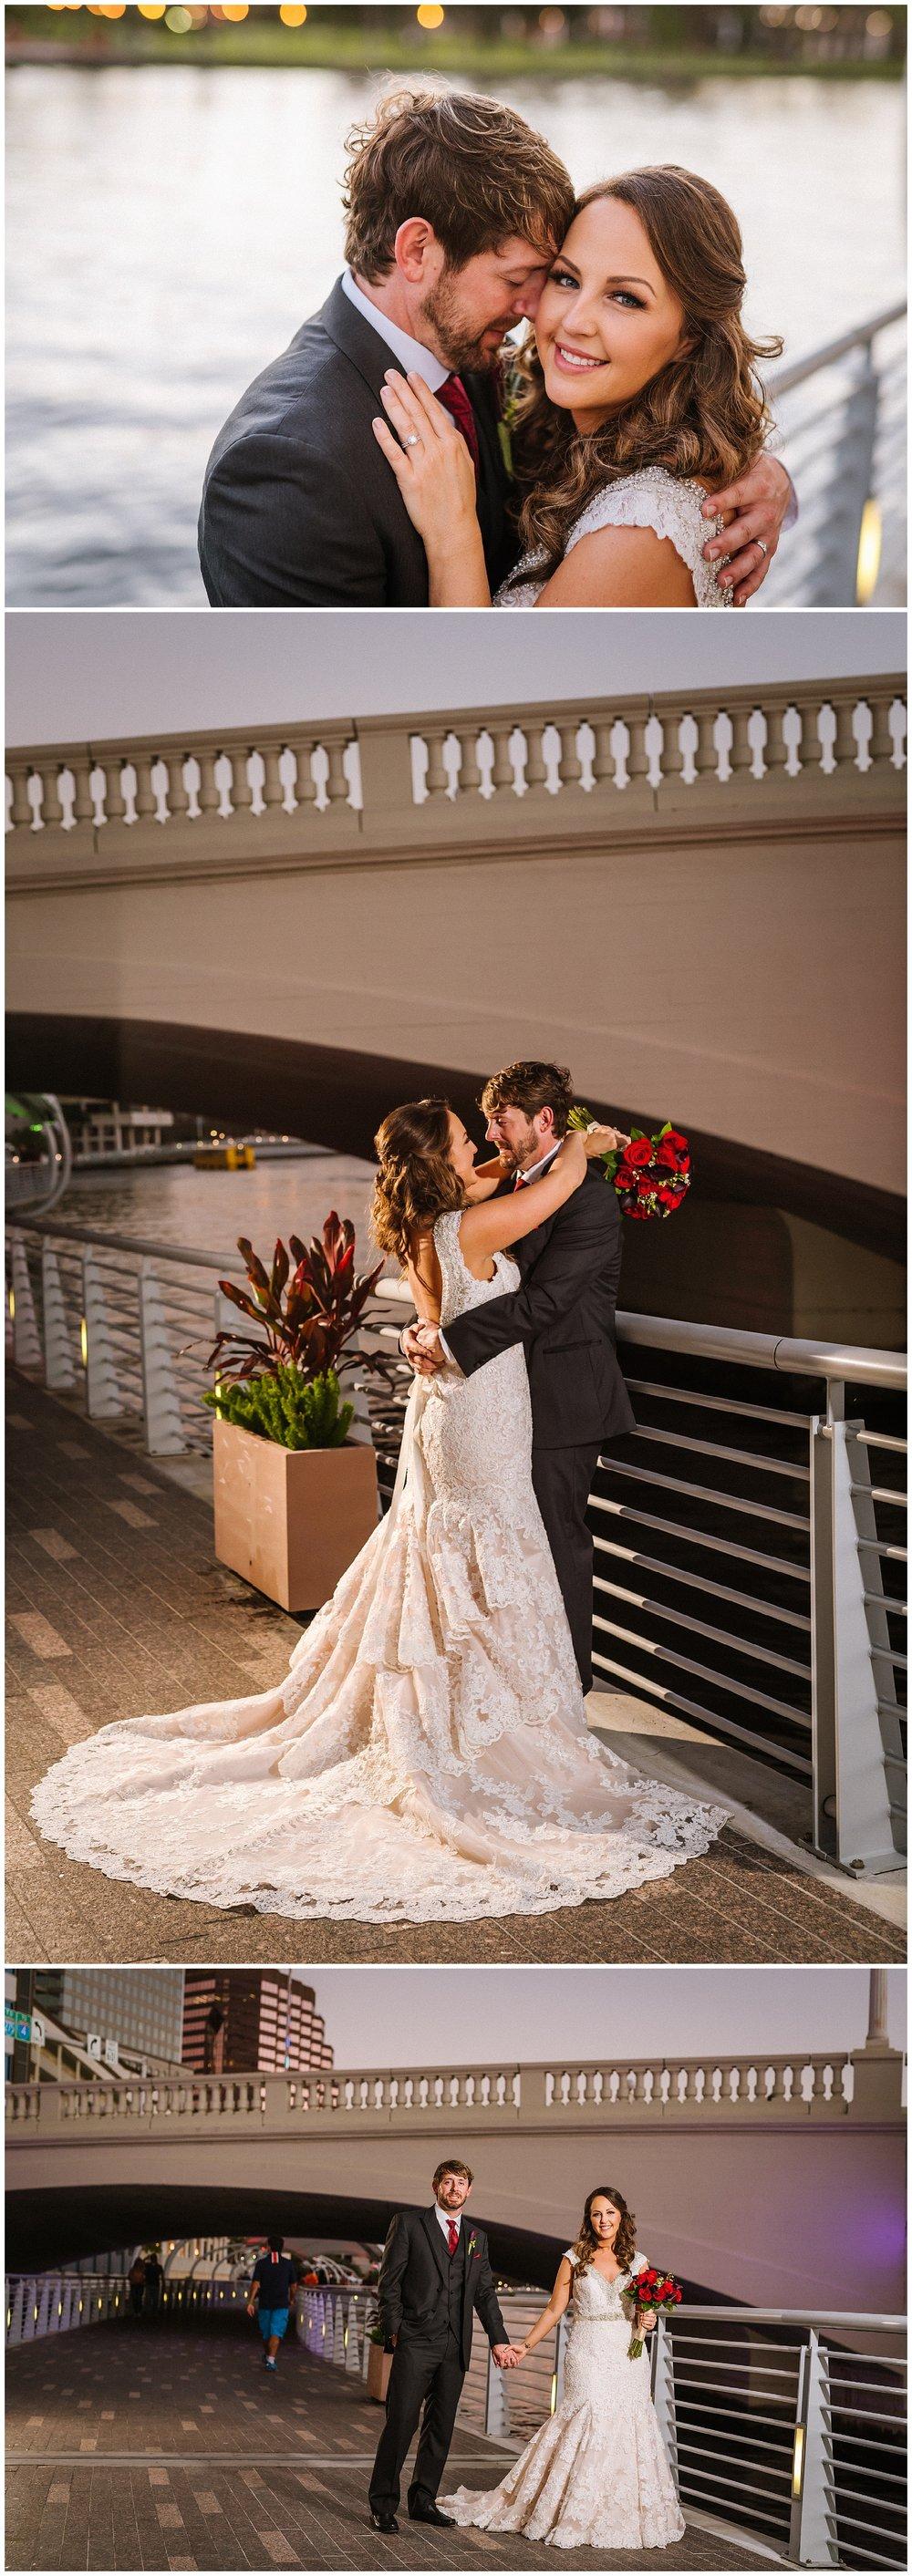 downtown-tampa-riverwalk-wedding-photography-seraton_0024.jpg